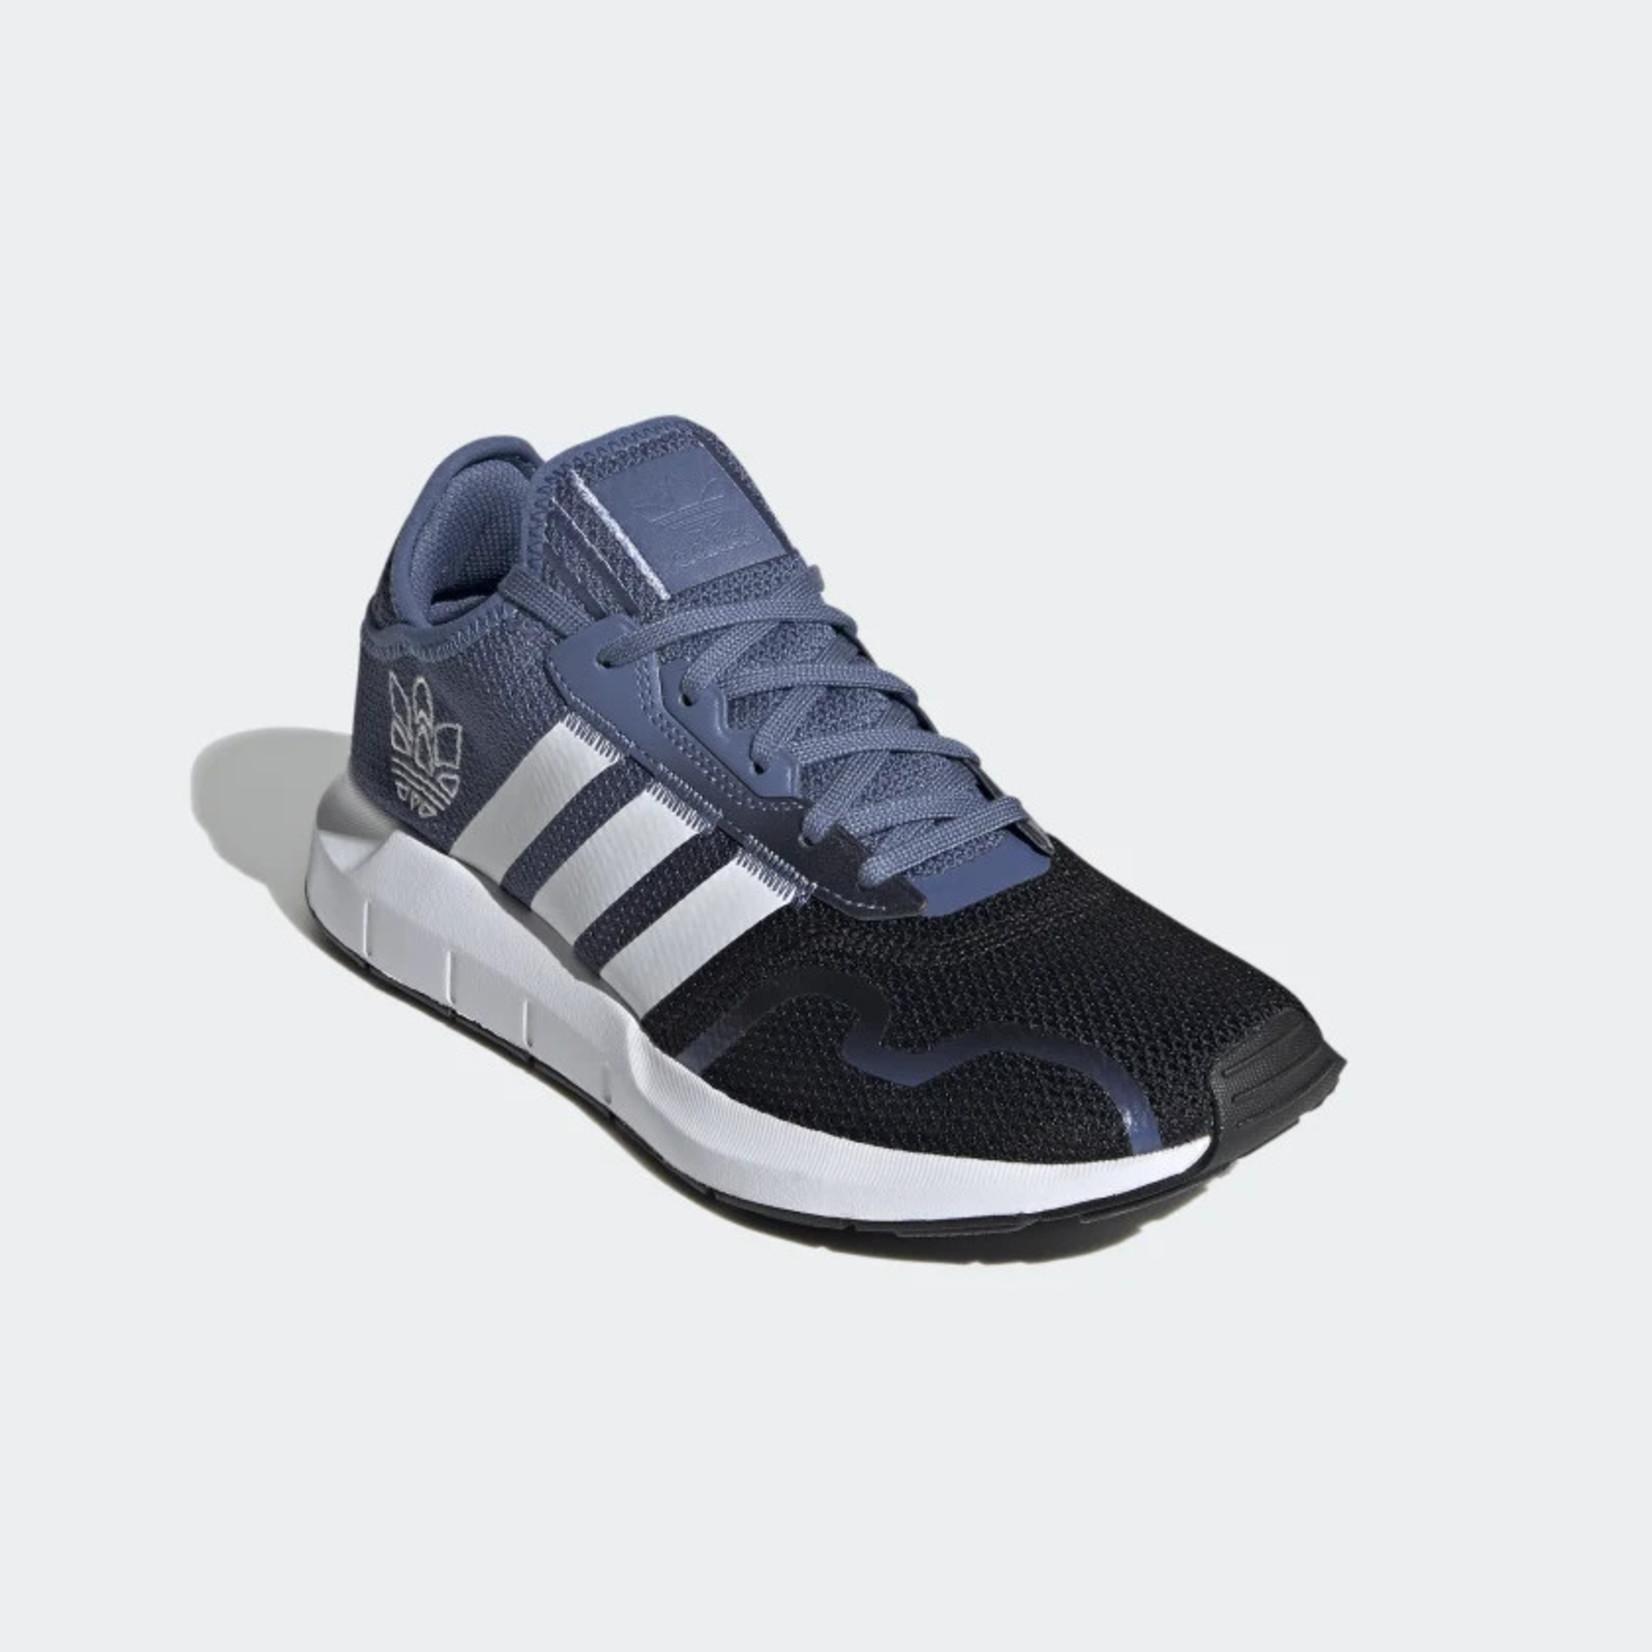 Adidas Adidas Swift Run X Sneakers